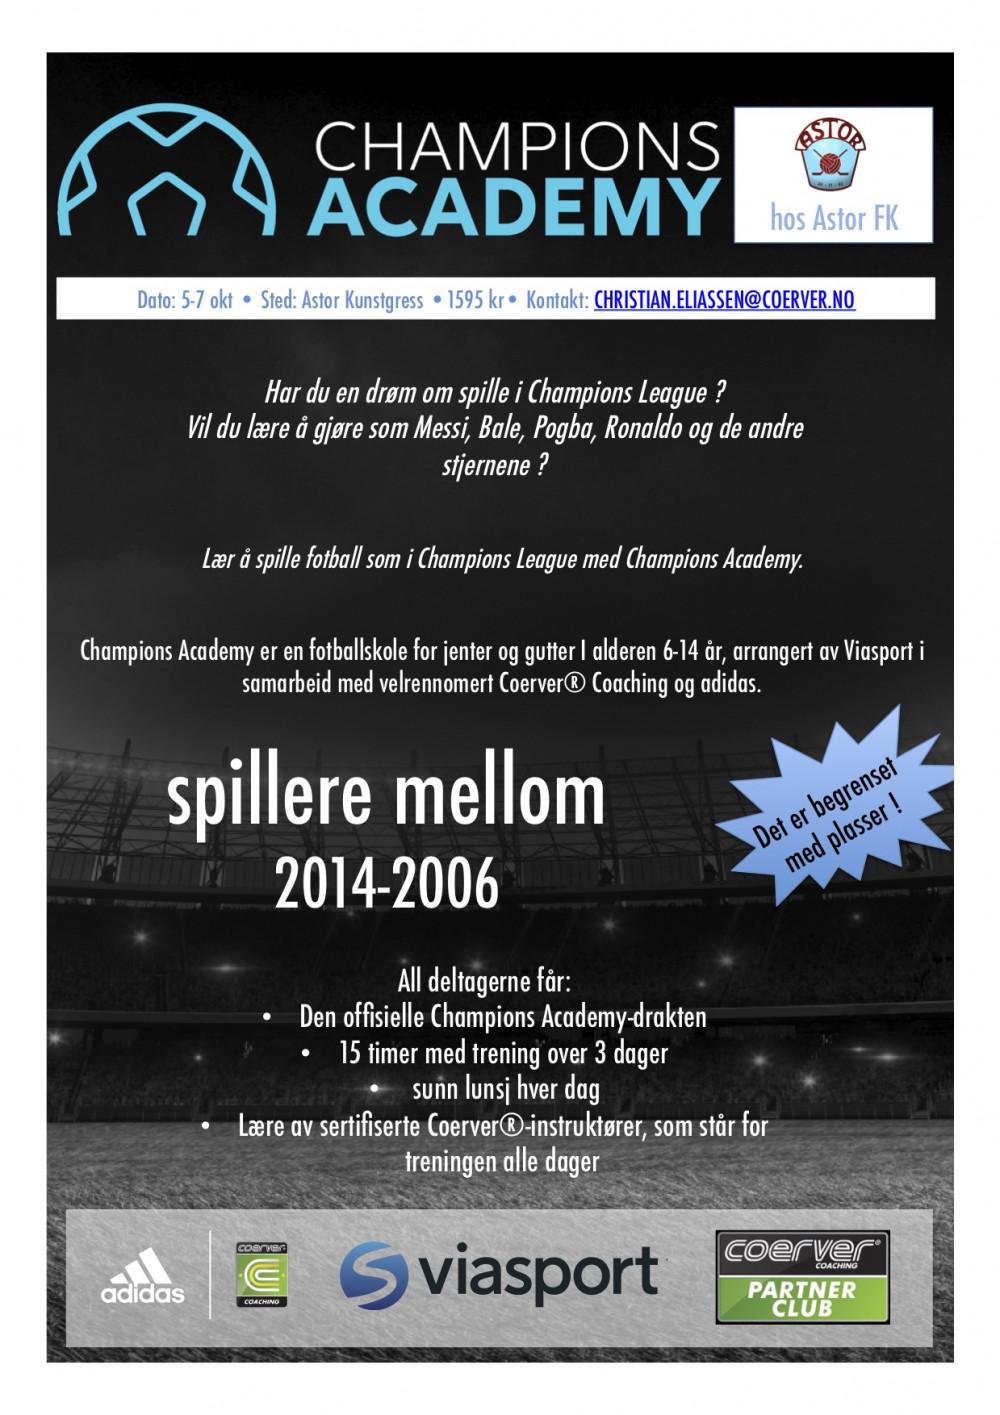 Champions Academy hos Astor FK  2020